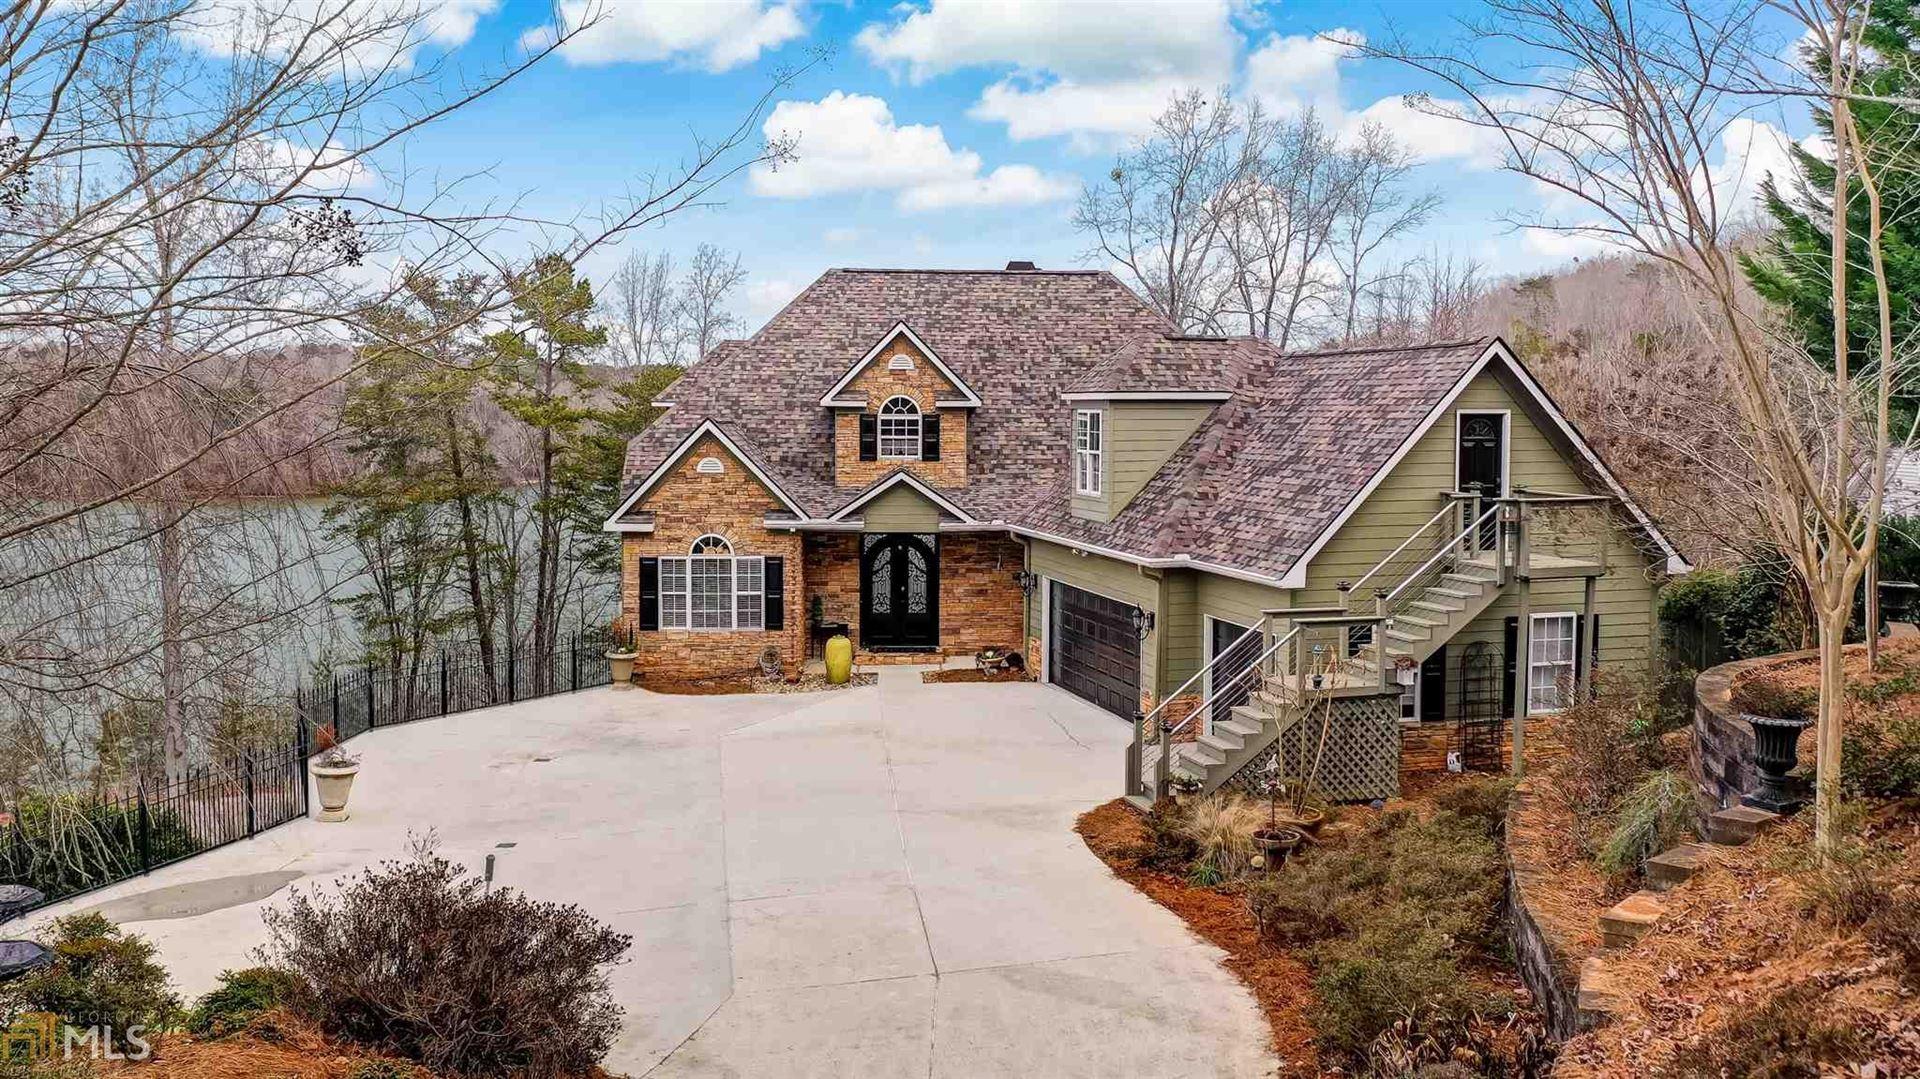 3222 Winterberry Ln, Gainesville, GA 30501 - MLS#: 8902883